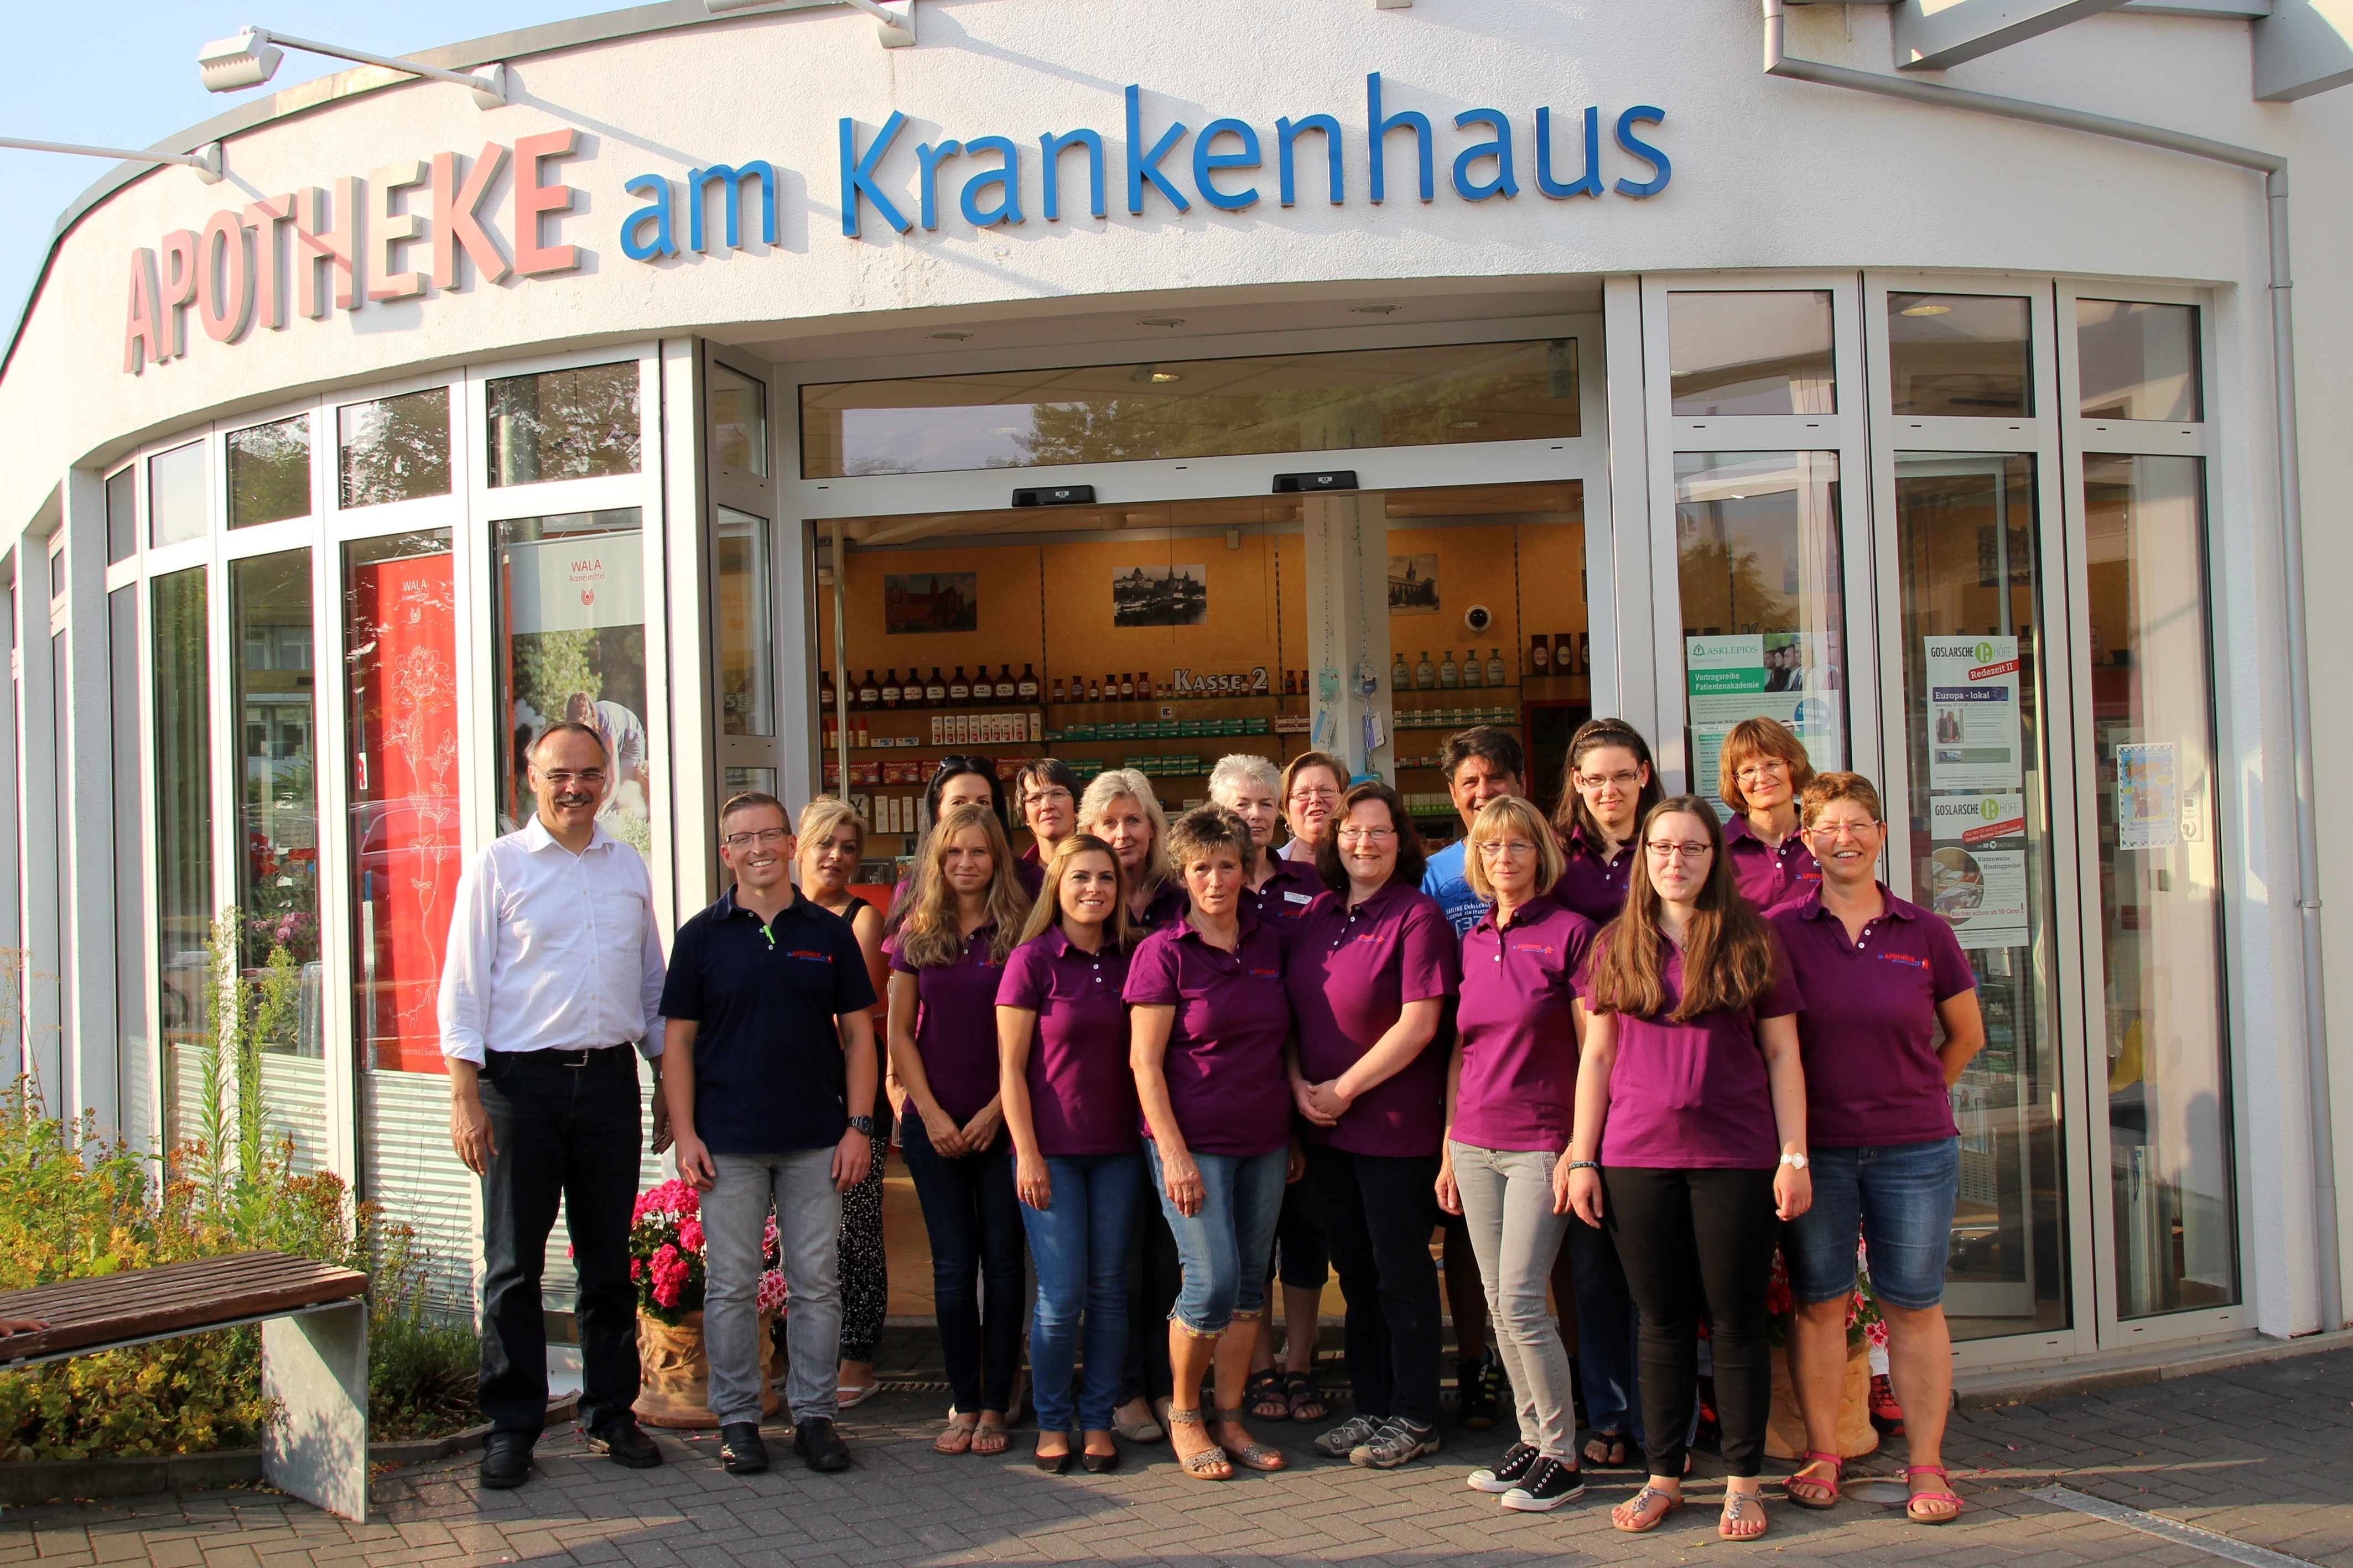 Team der Apotheke am Krankenhaus - Filialapotheke der Löwen Apotheke Oker